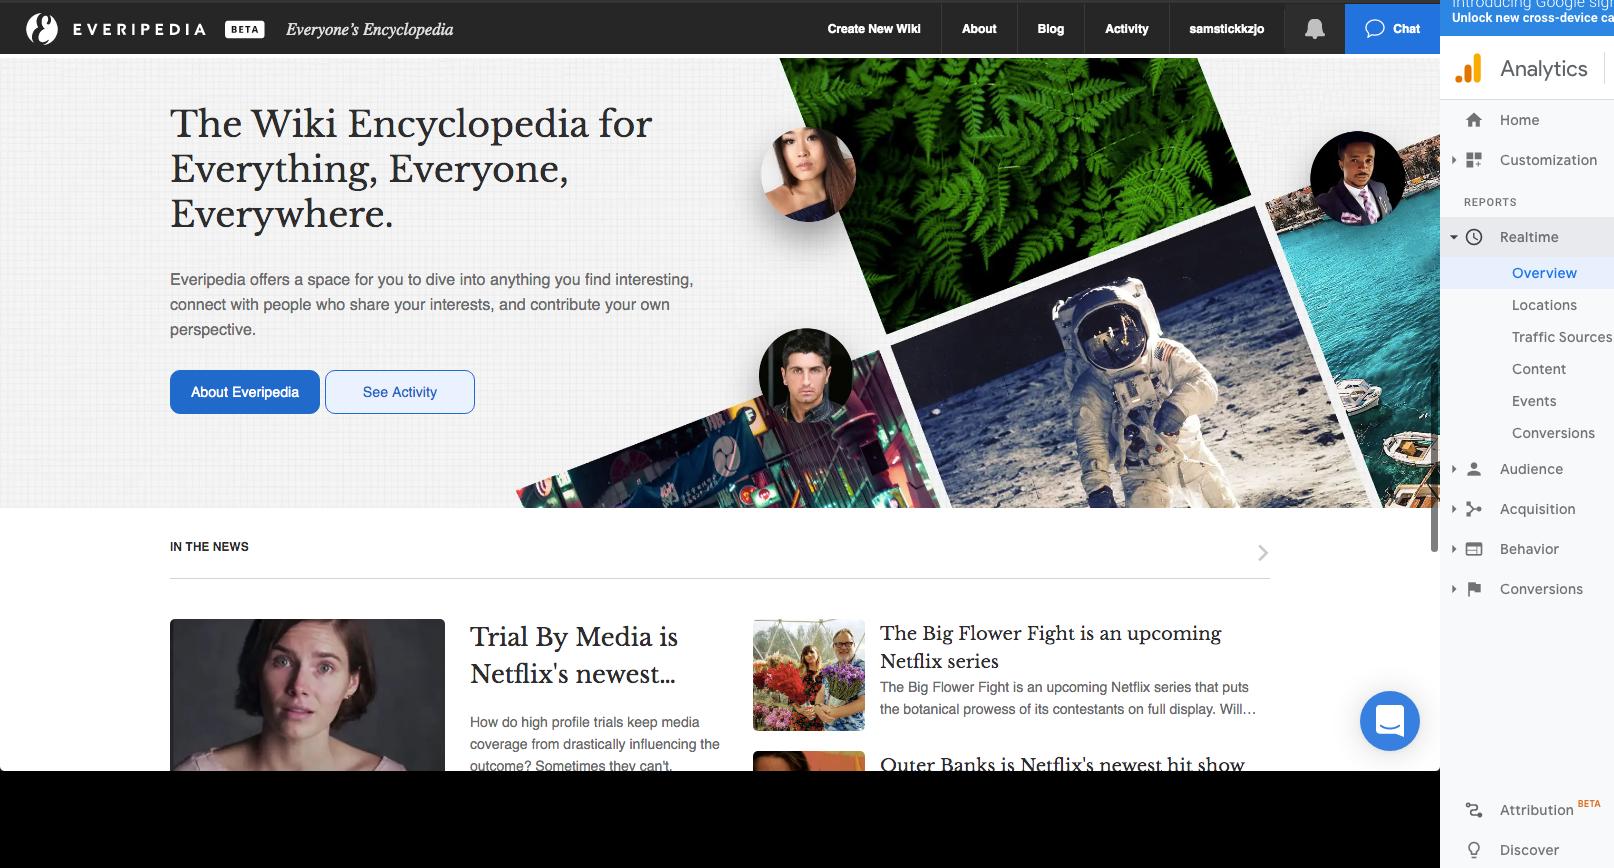 everipedia.org